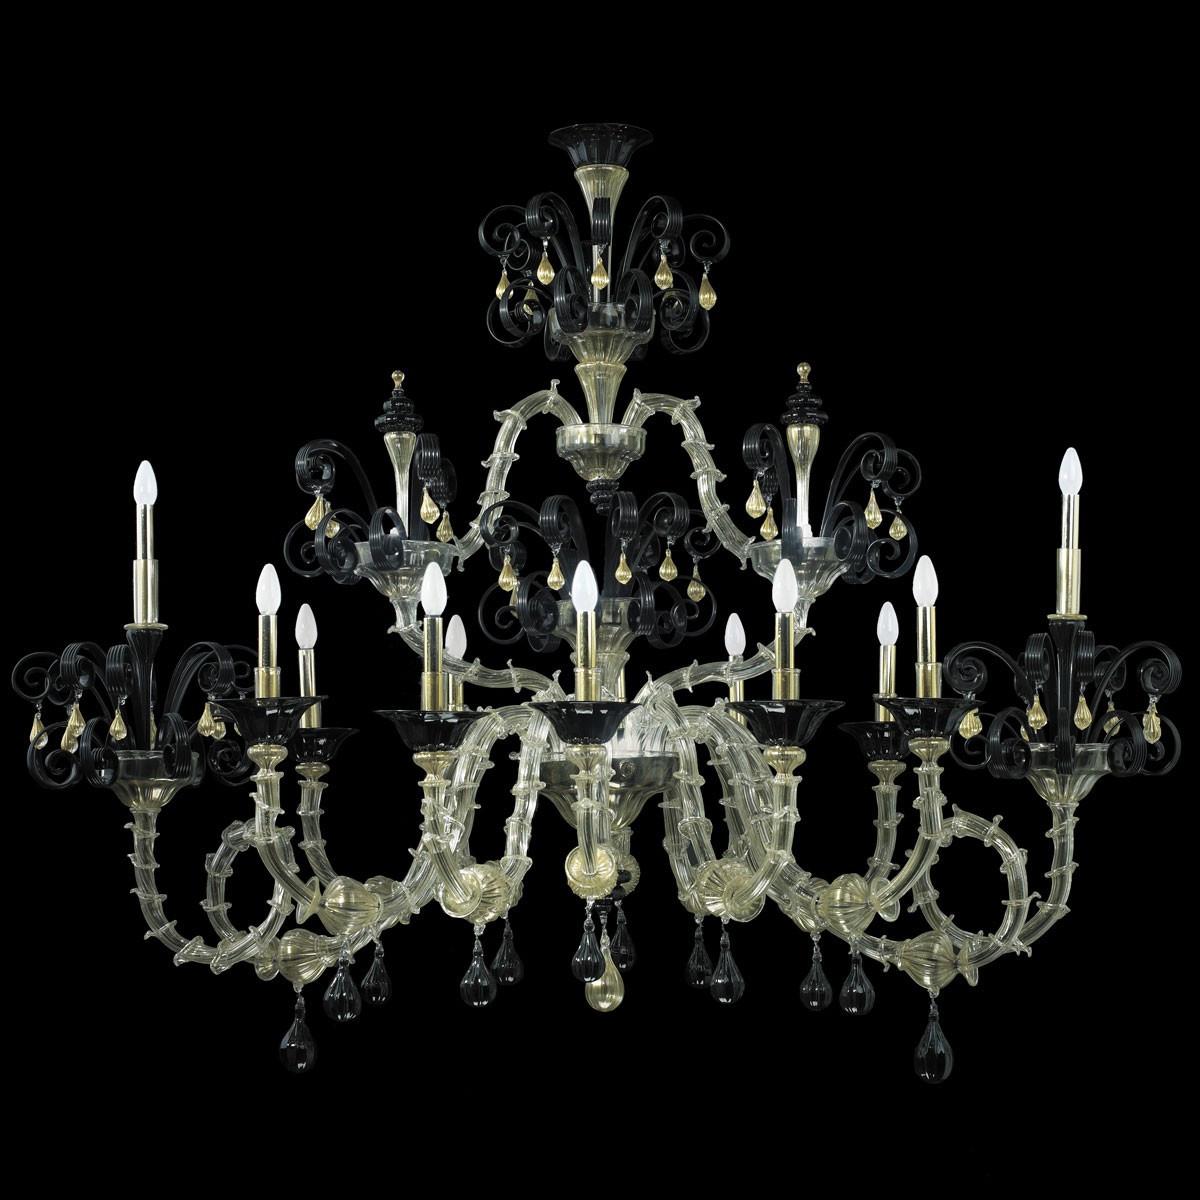 """Nerino"" lustre en verre de Murano - 12 lumieres"